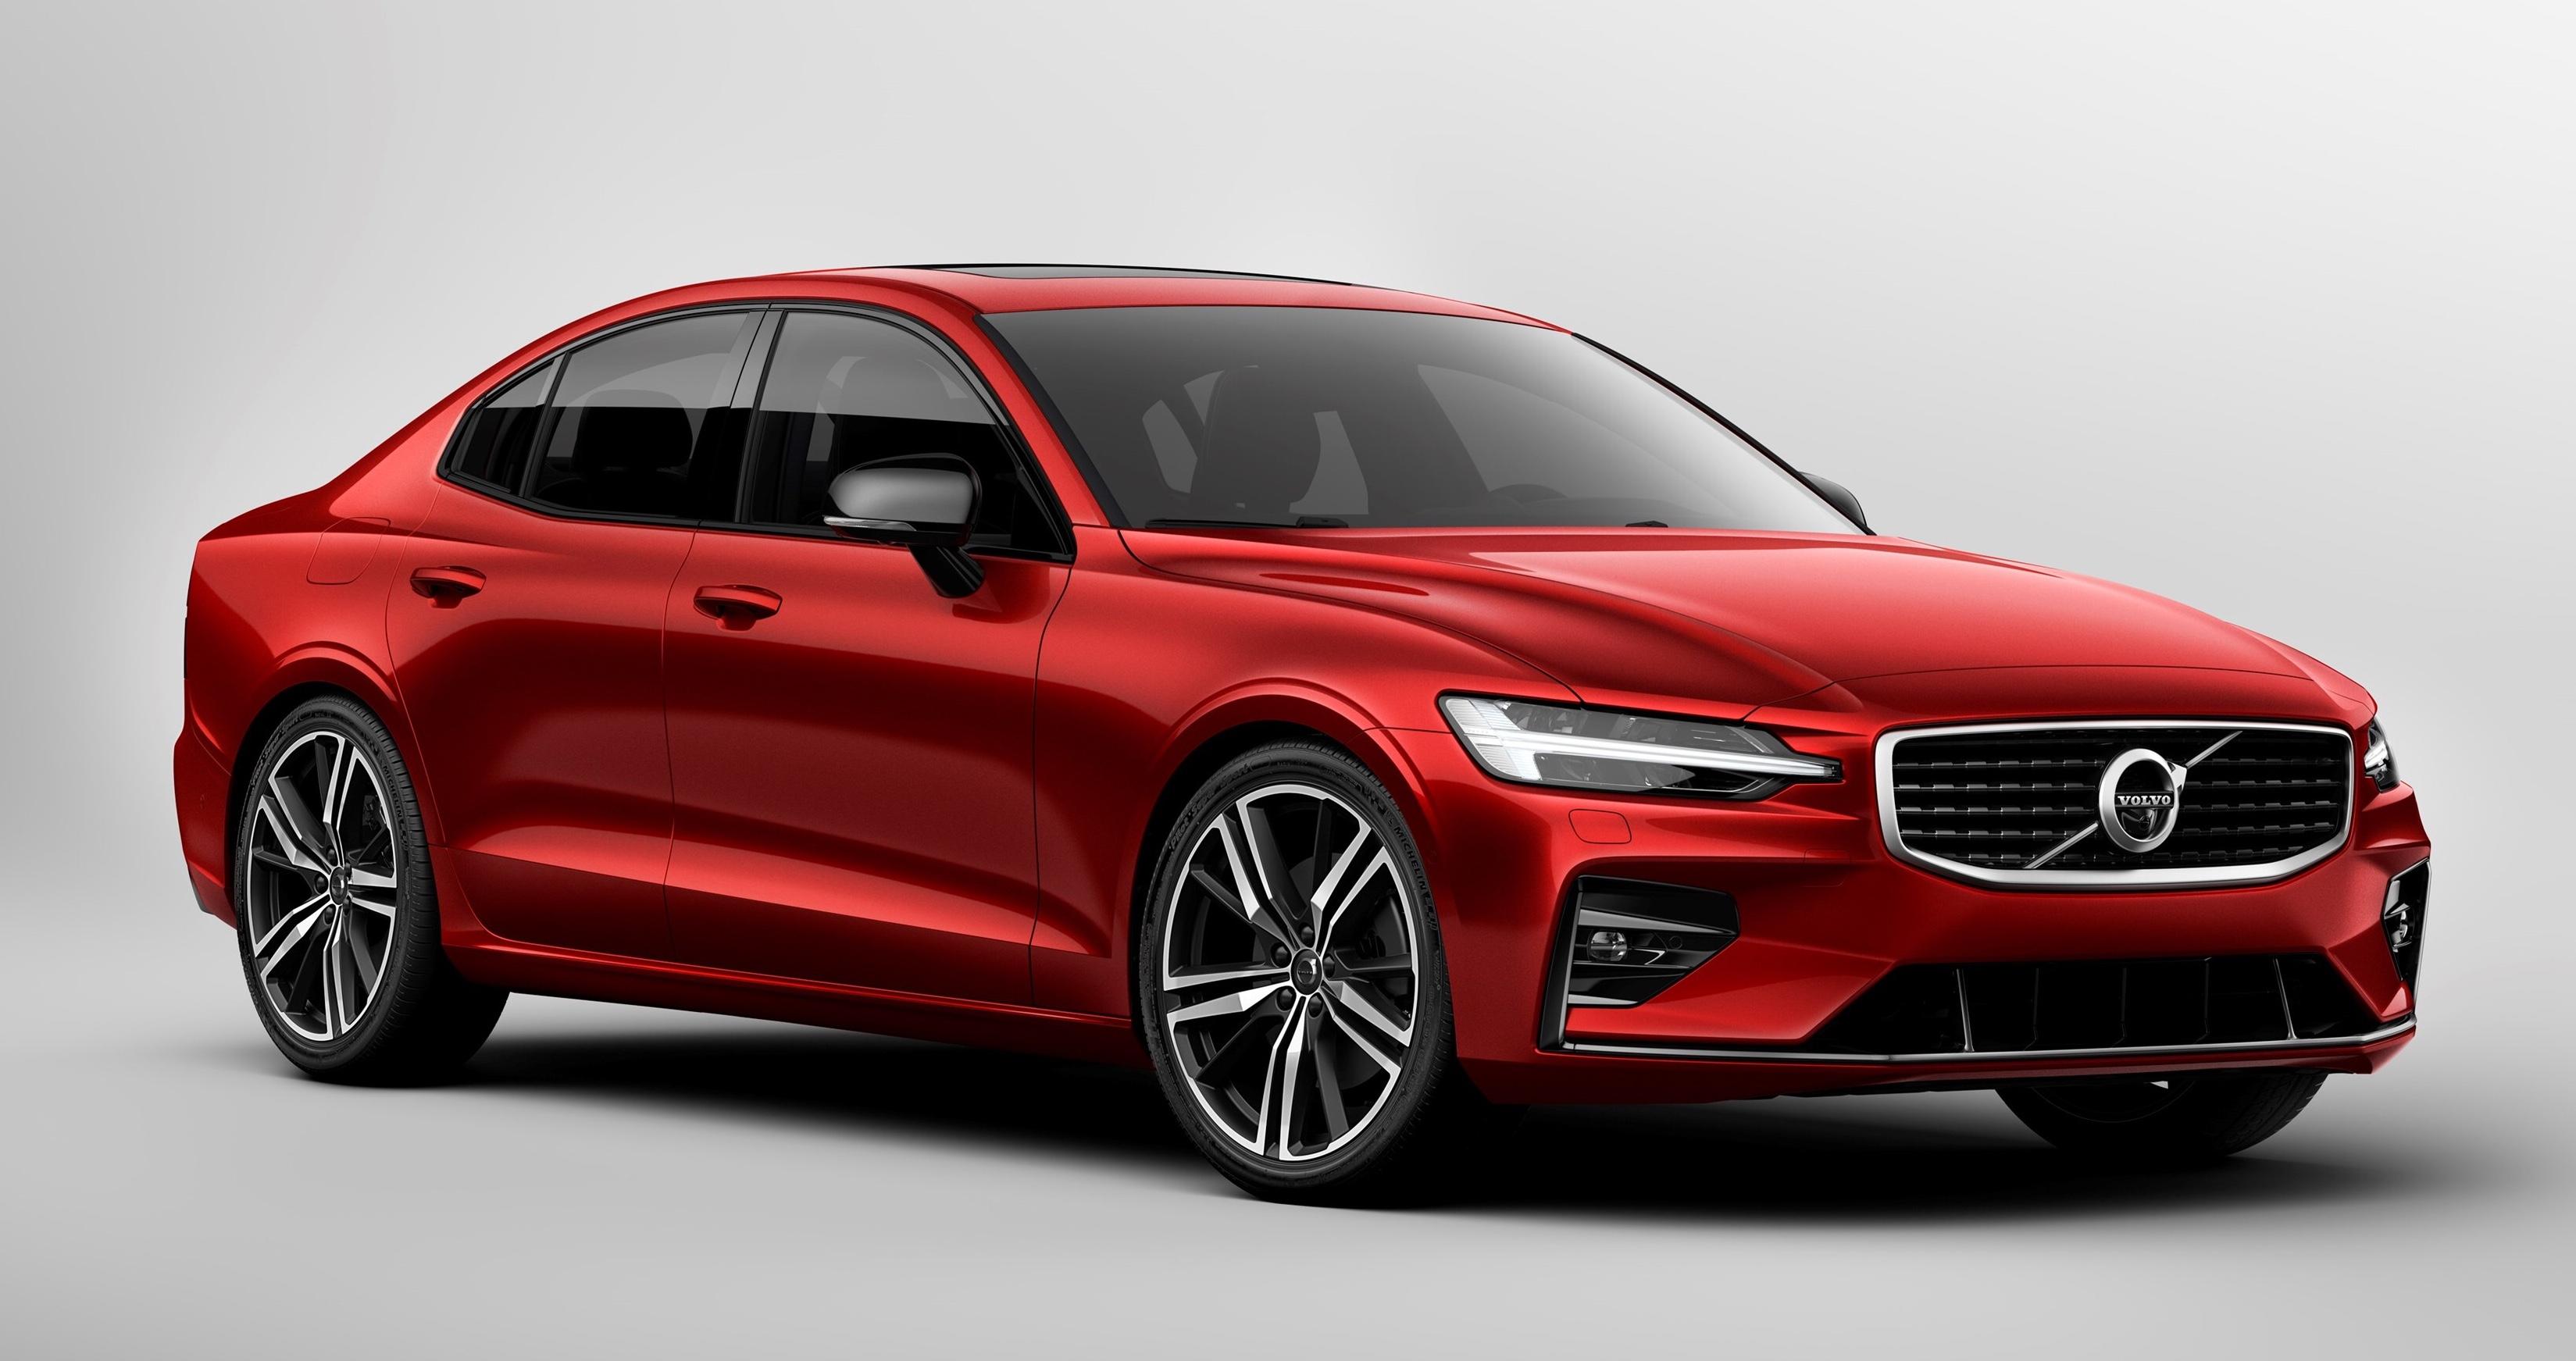 Volvo Cars launches new S60 sports sedan